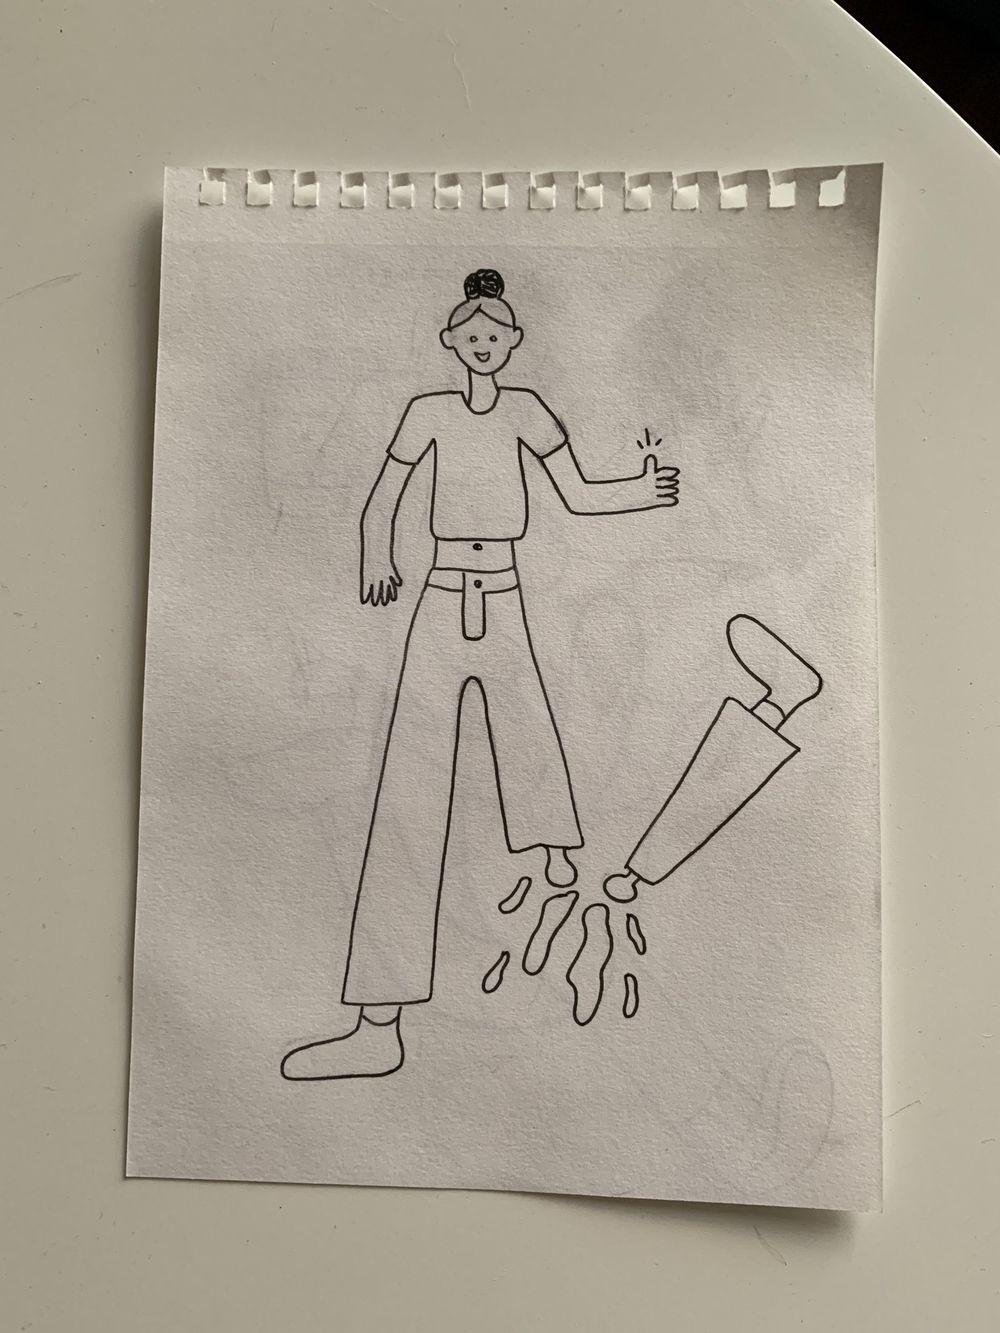 Break a leg! - image 2 - student project